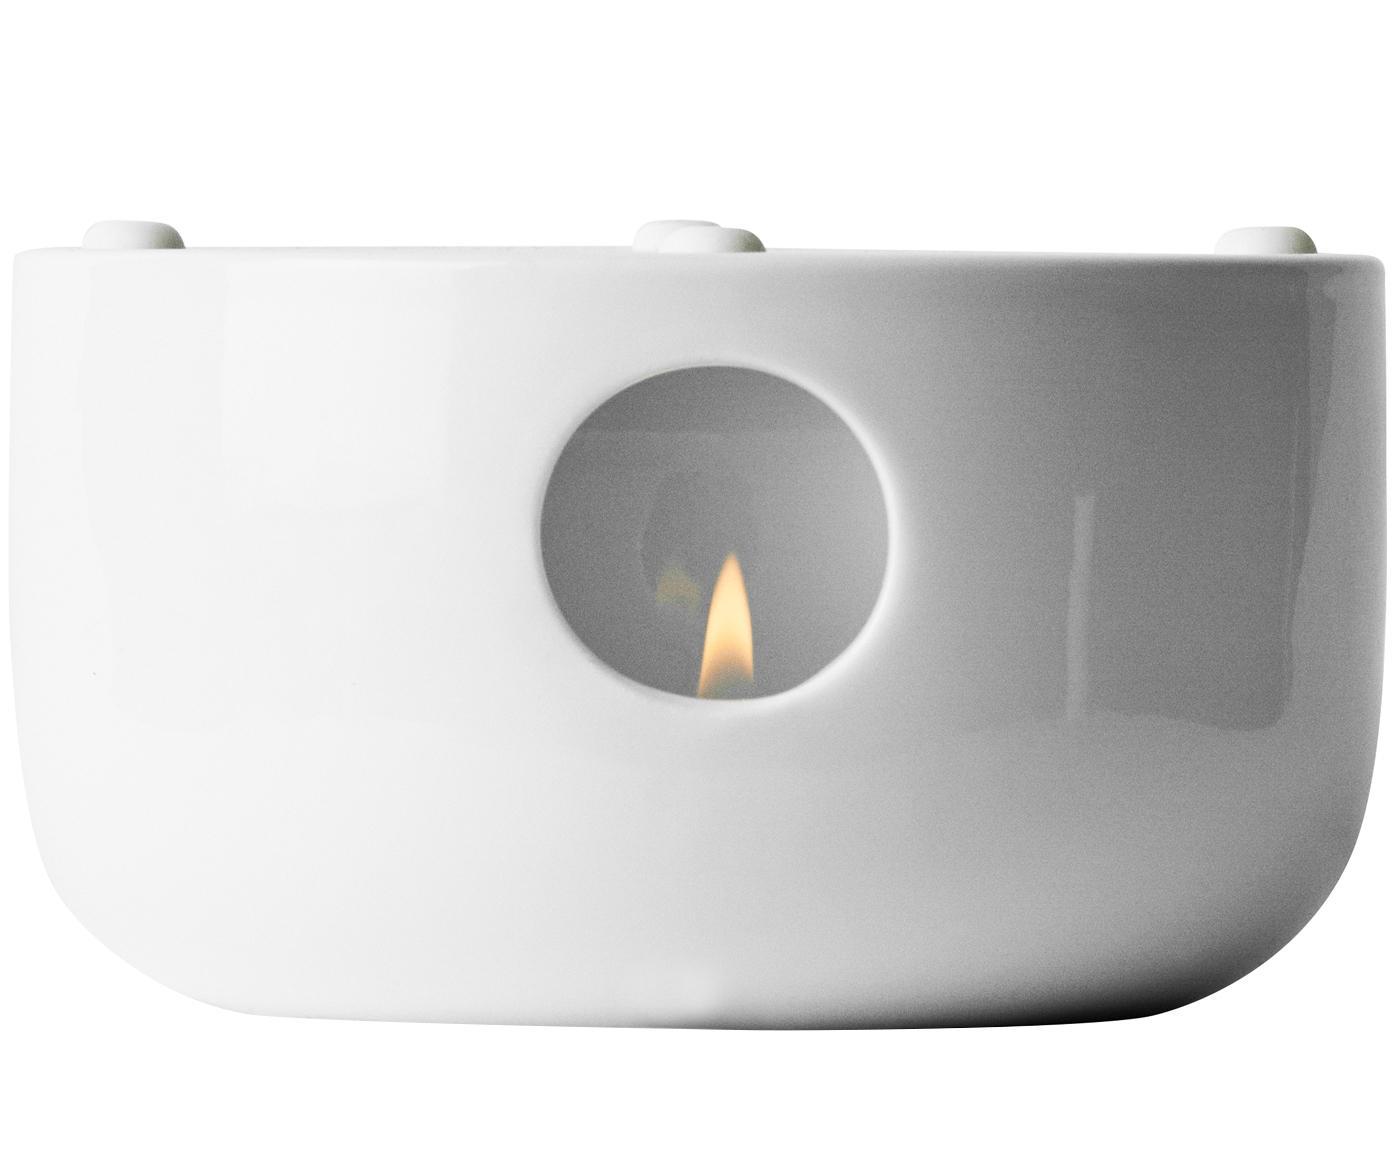 Calentador Kettle, Porcelana, silicona, Transparente, blanco, Ø 14 x Al 7 cm